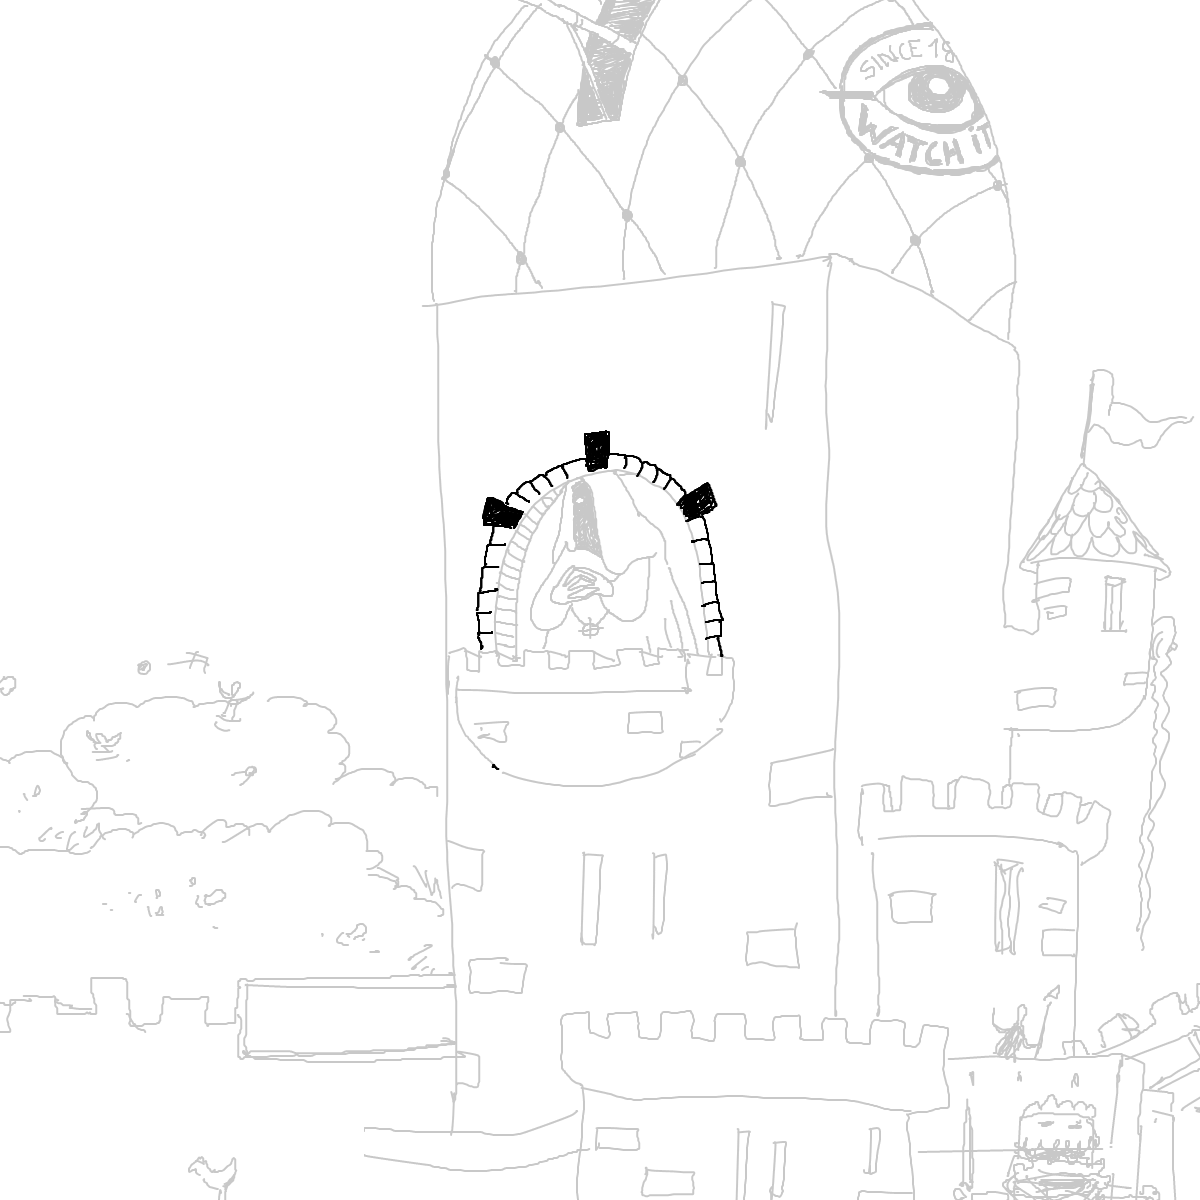 BAAAM drawing#3812 lat:78.4176025390625000lng: -4.4395499229431150